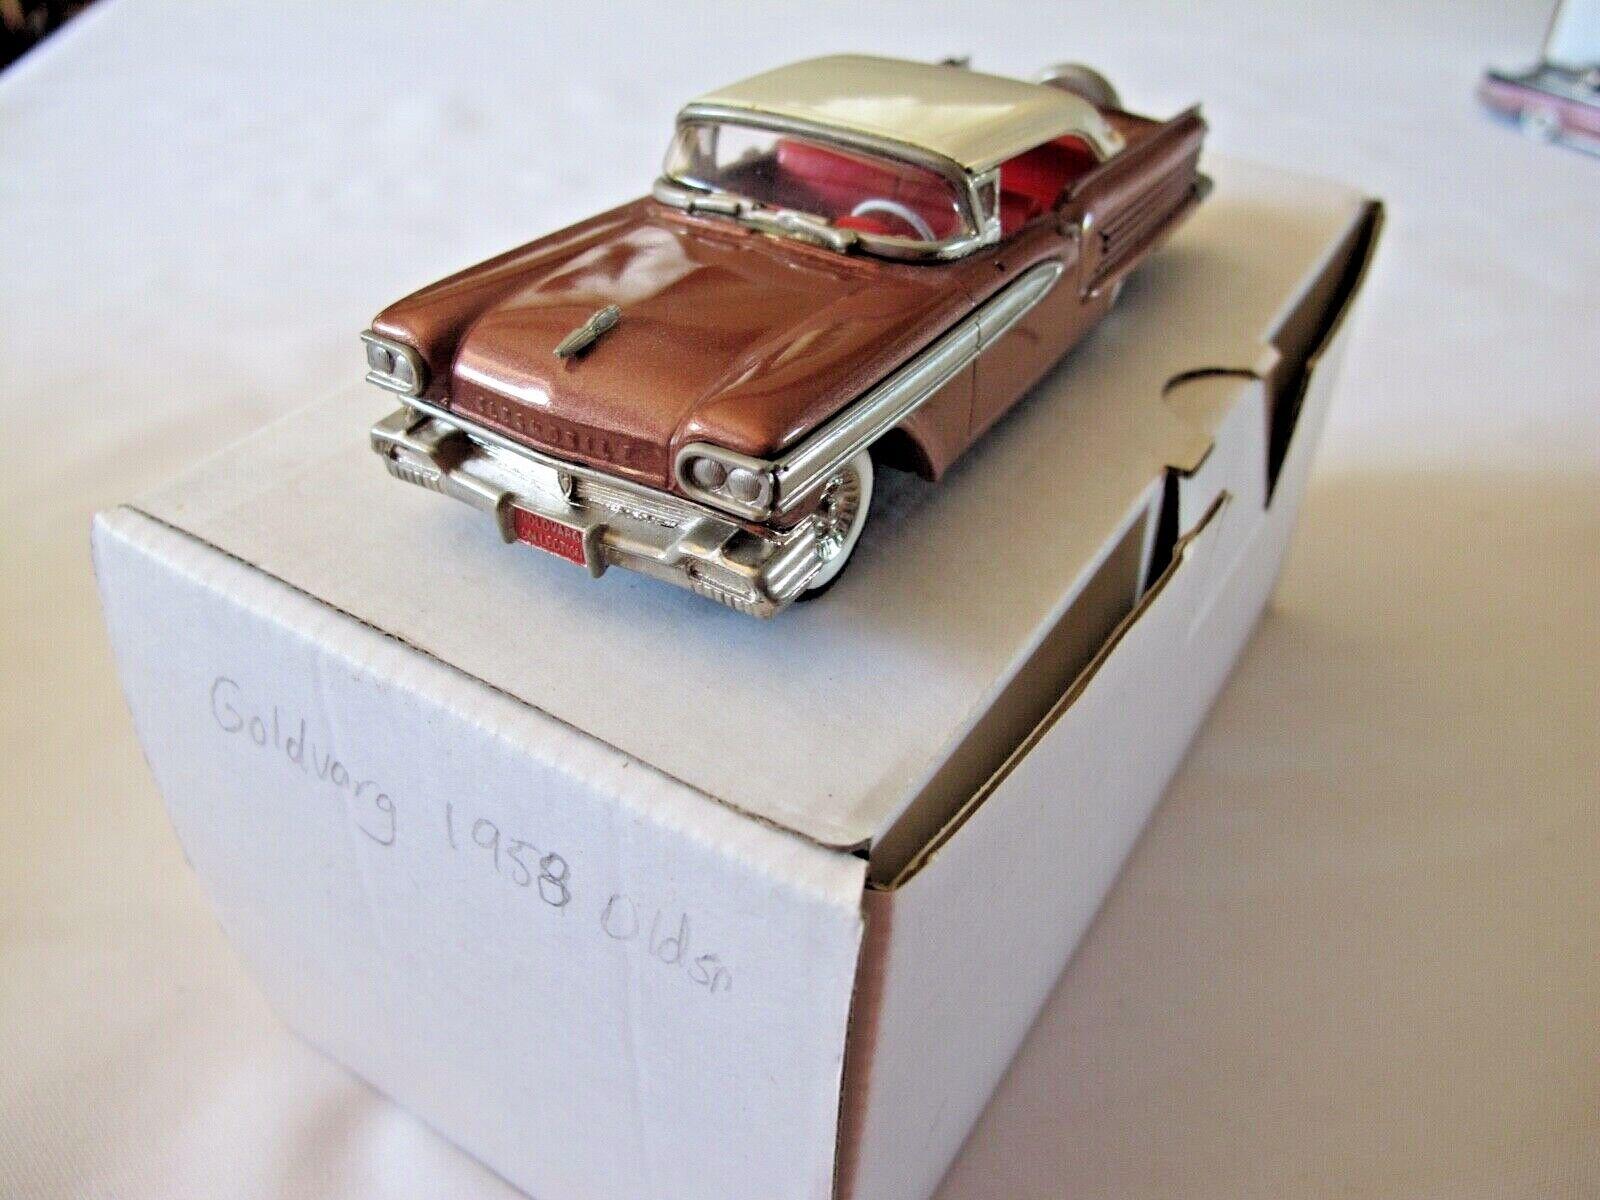 orVARG 1958 Oldsmobile 4 portes hardtop leur dernier Métal Blanc Modèle 1 43 Comme neuf IN BOX